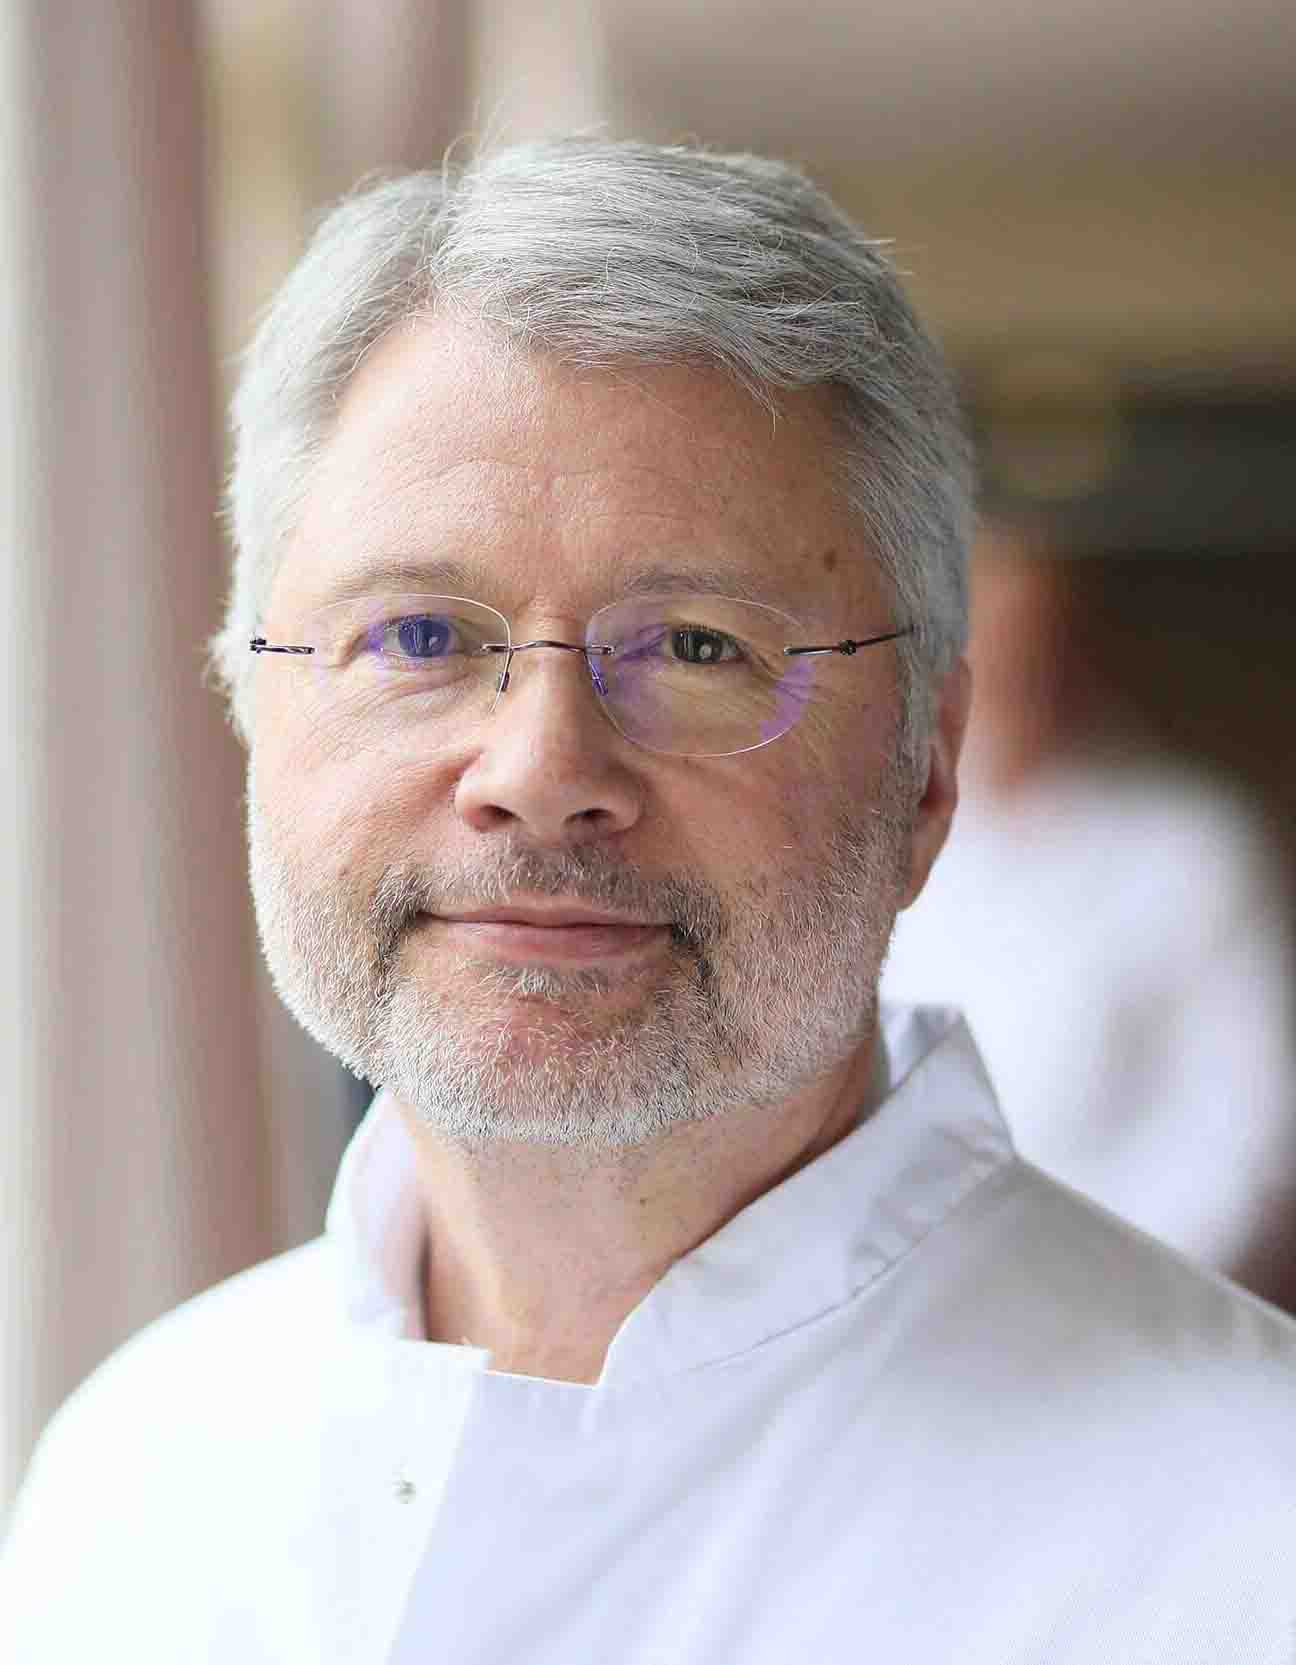 Dr. med. Wolfgang Lehmann-Leo Chefarzt Rheumatologie der MEDIAN Fontana-Klinik Bad Liebenwerda